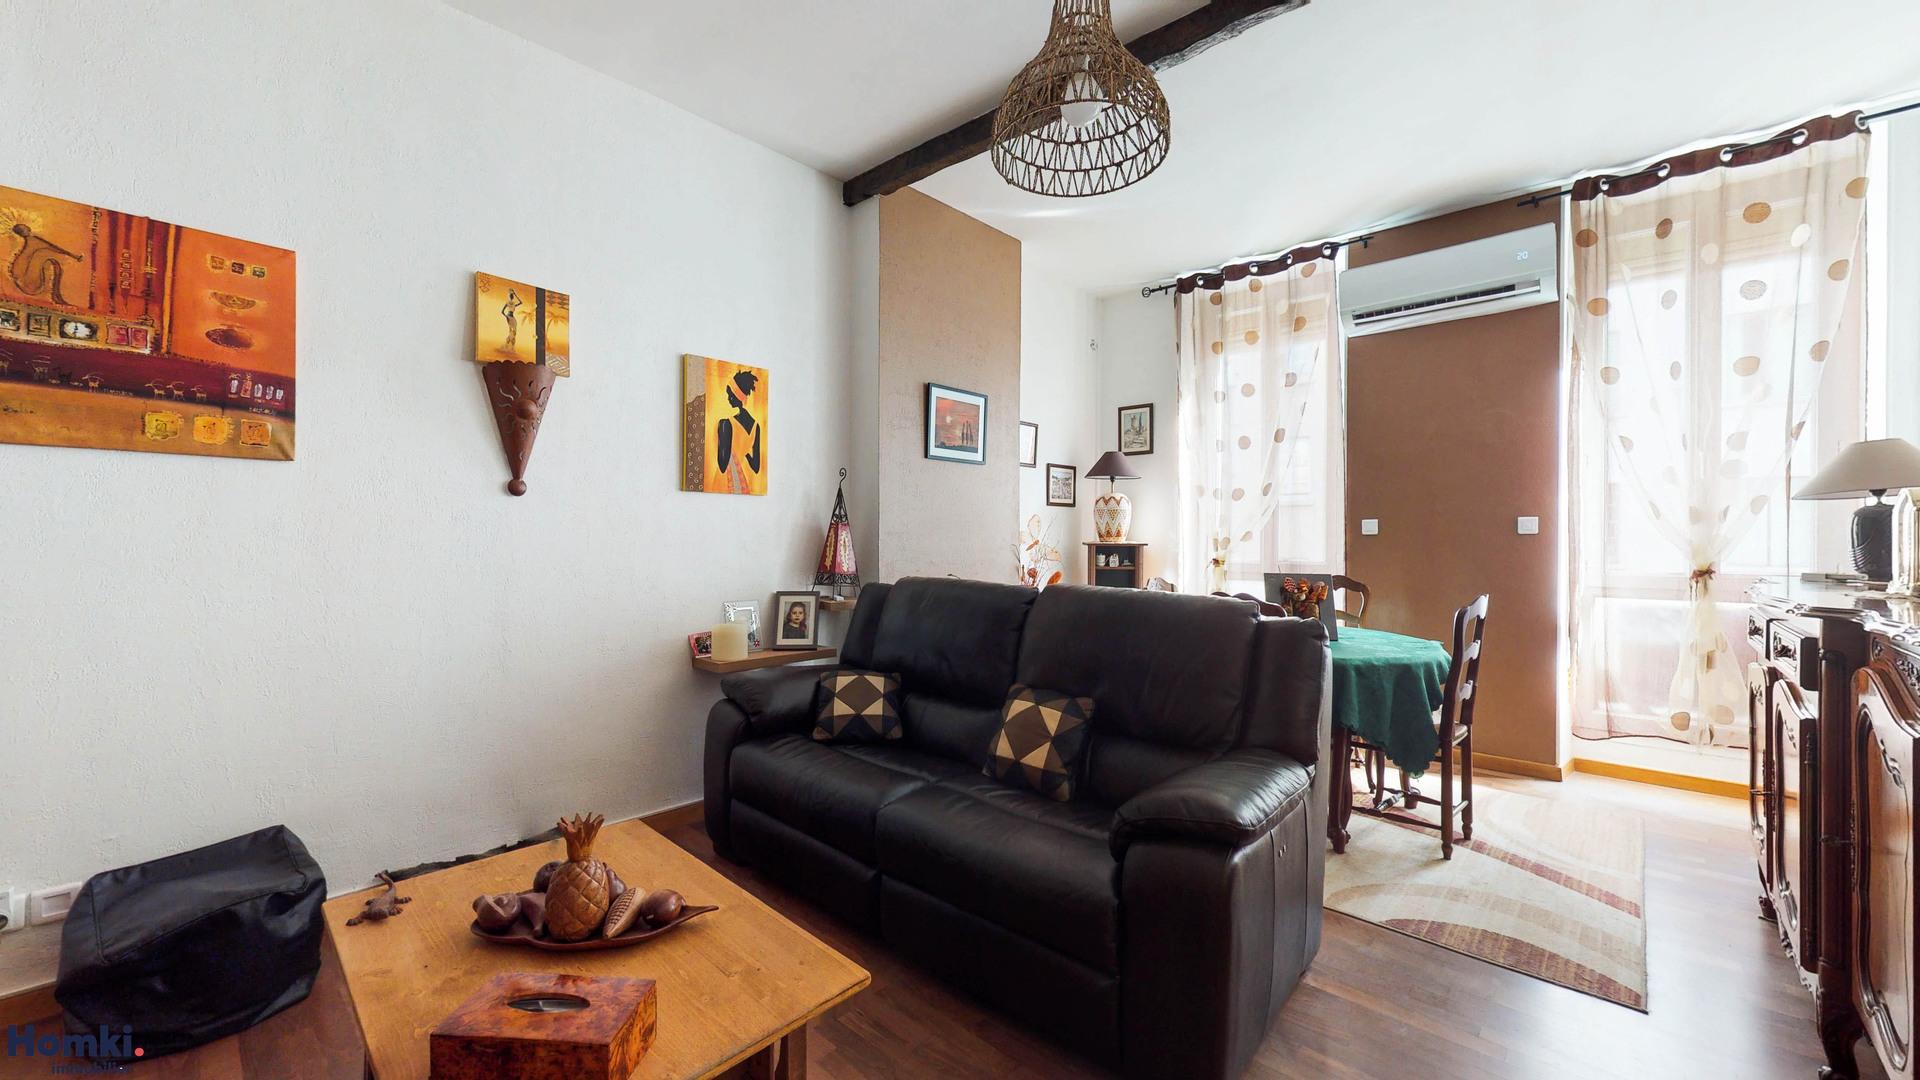 Vente Appartement 80 m² T4 13014 Marseille_2